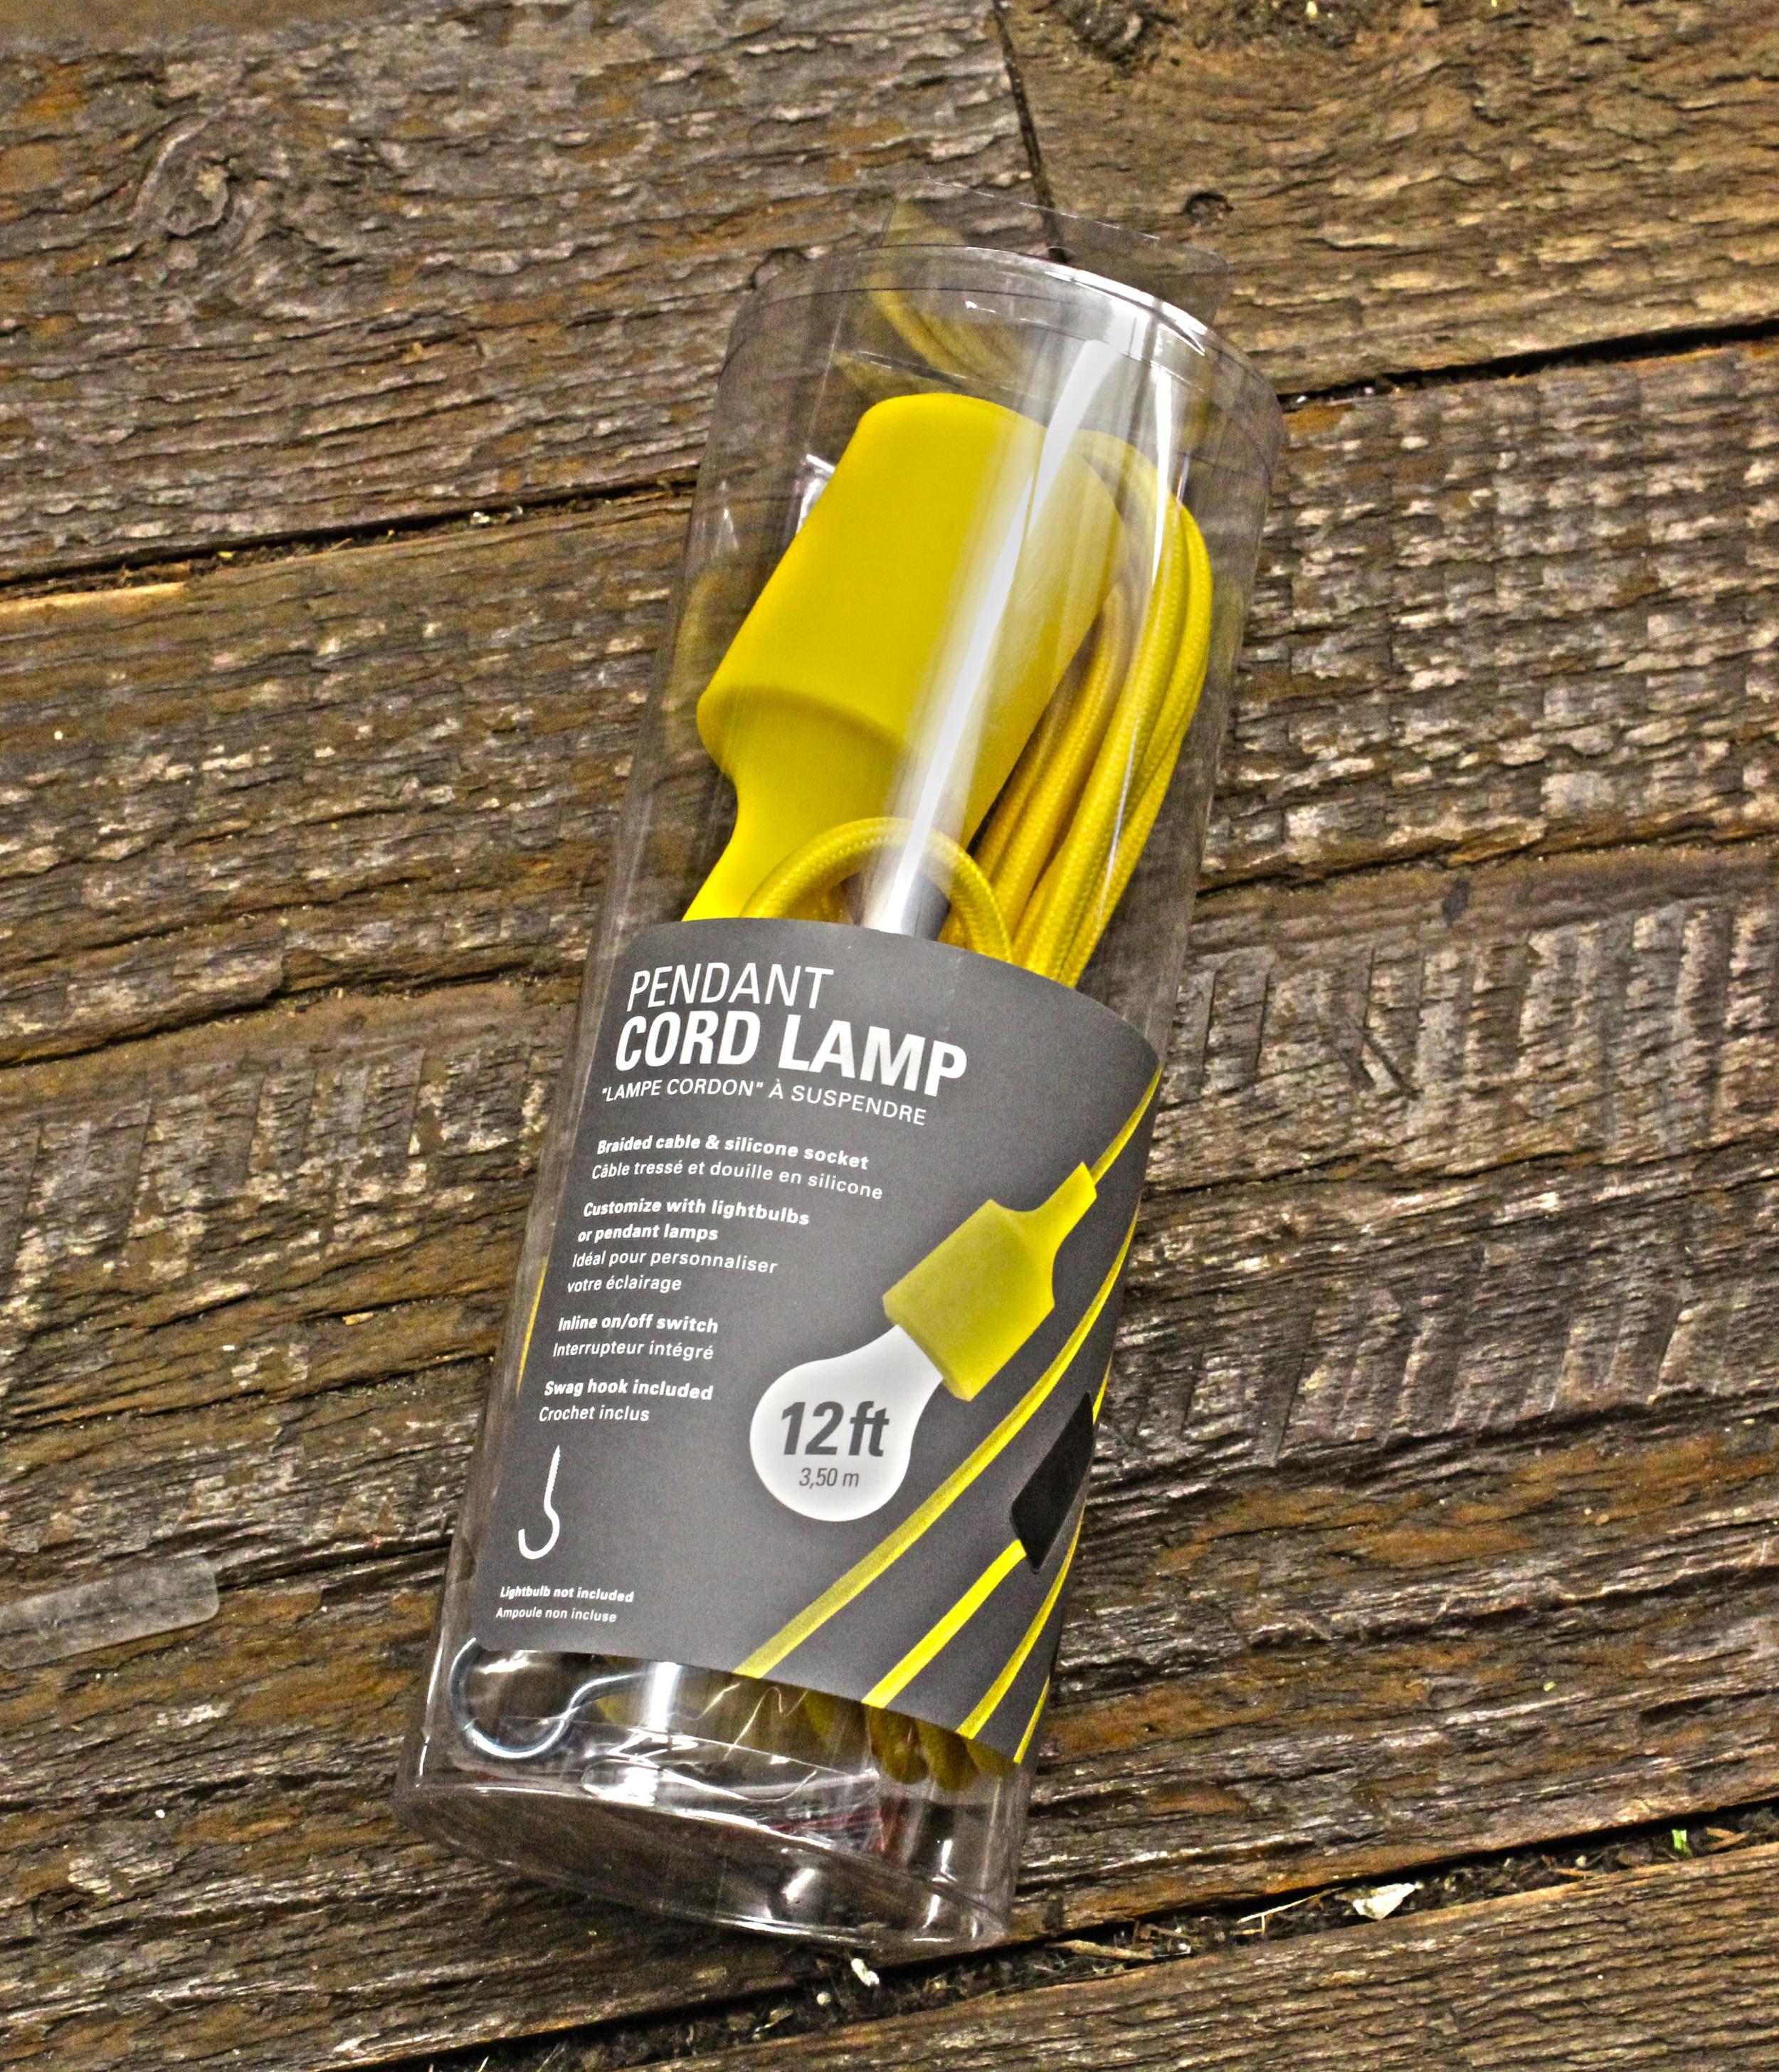 Kikkerland Products